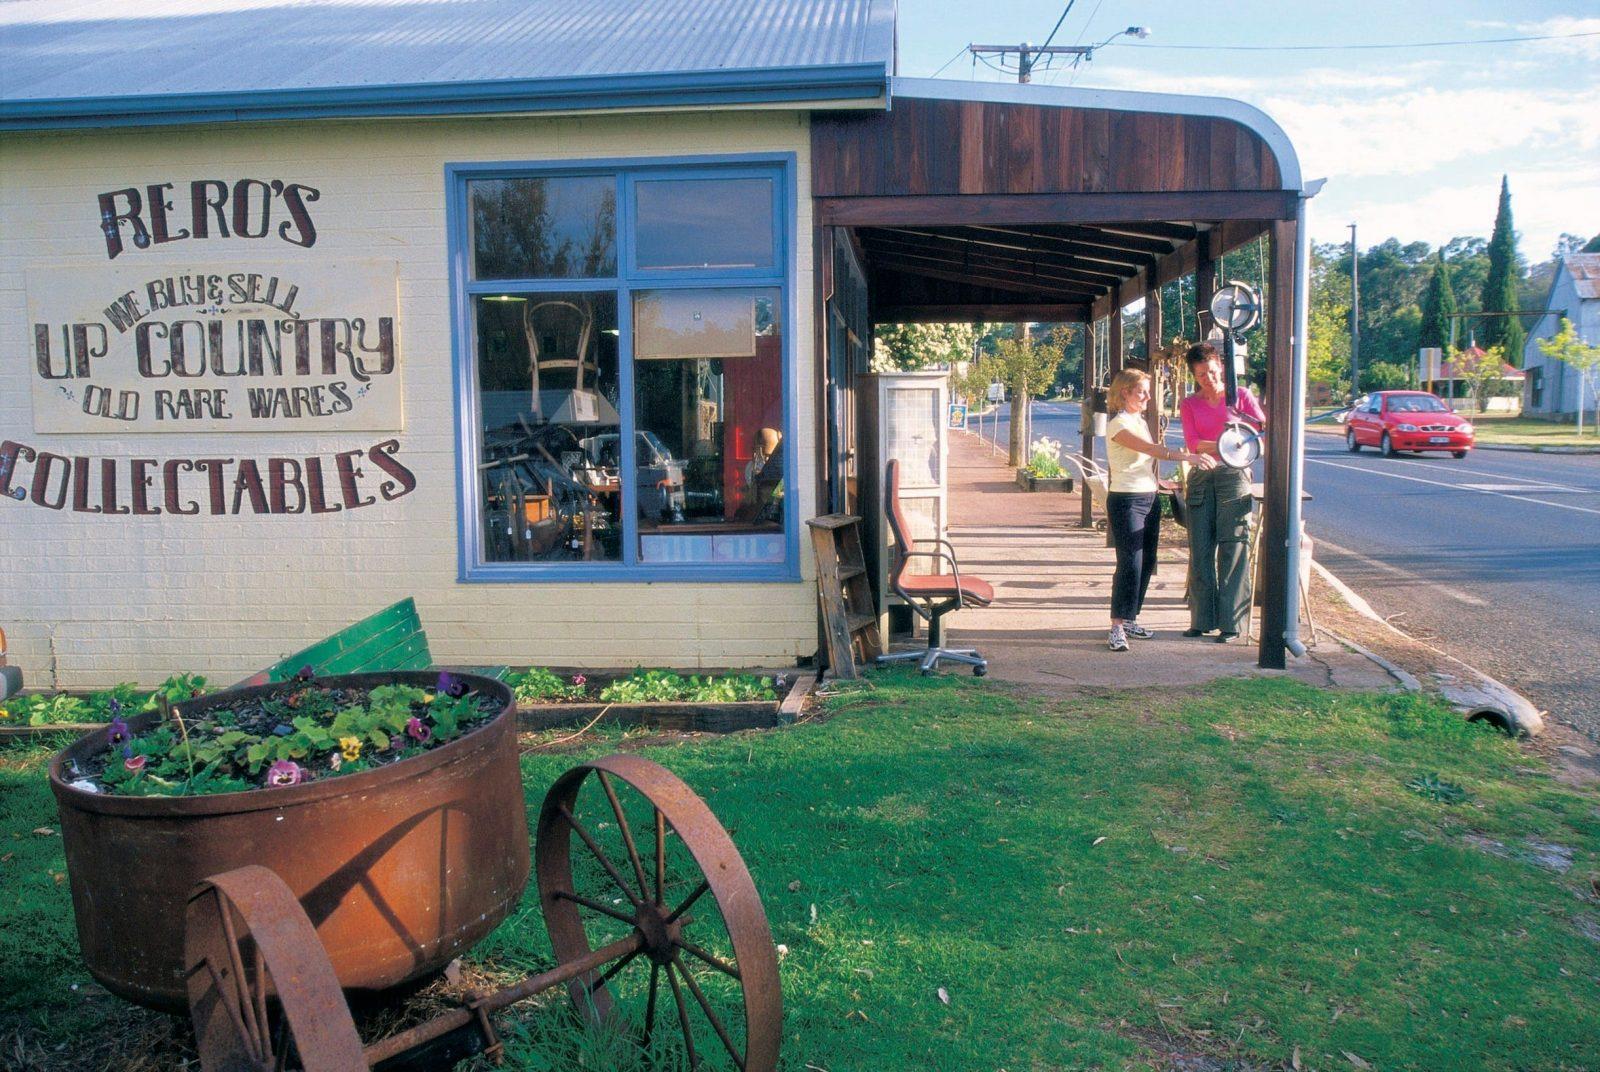 Blackwood River Valley Food and Beverage Trail, Balingup, Western Australia